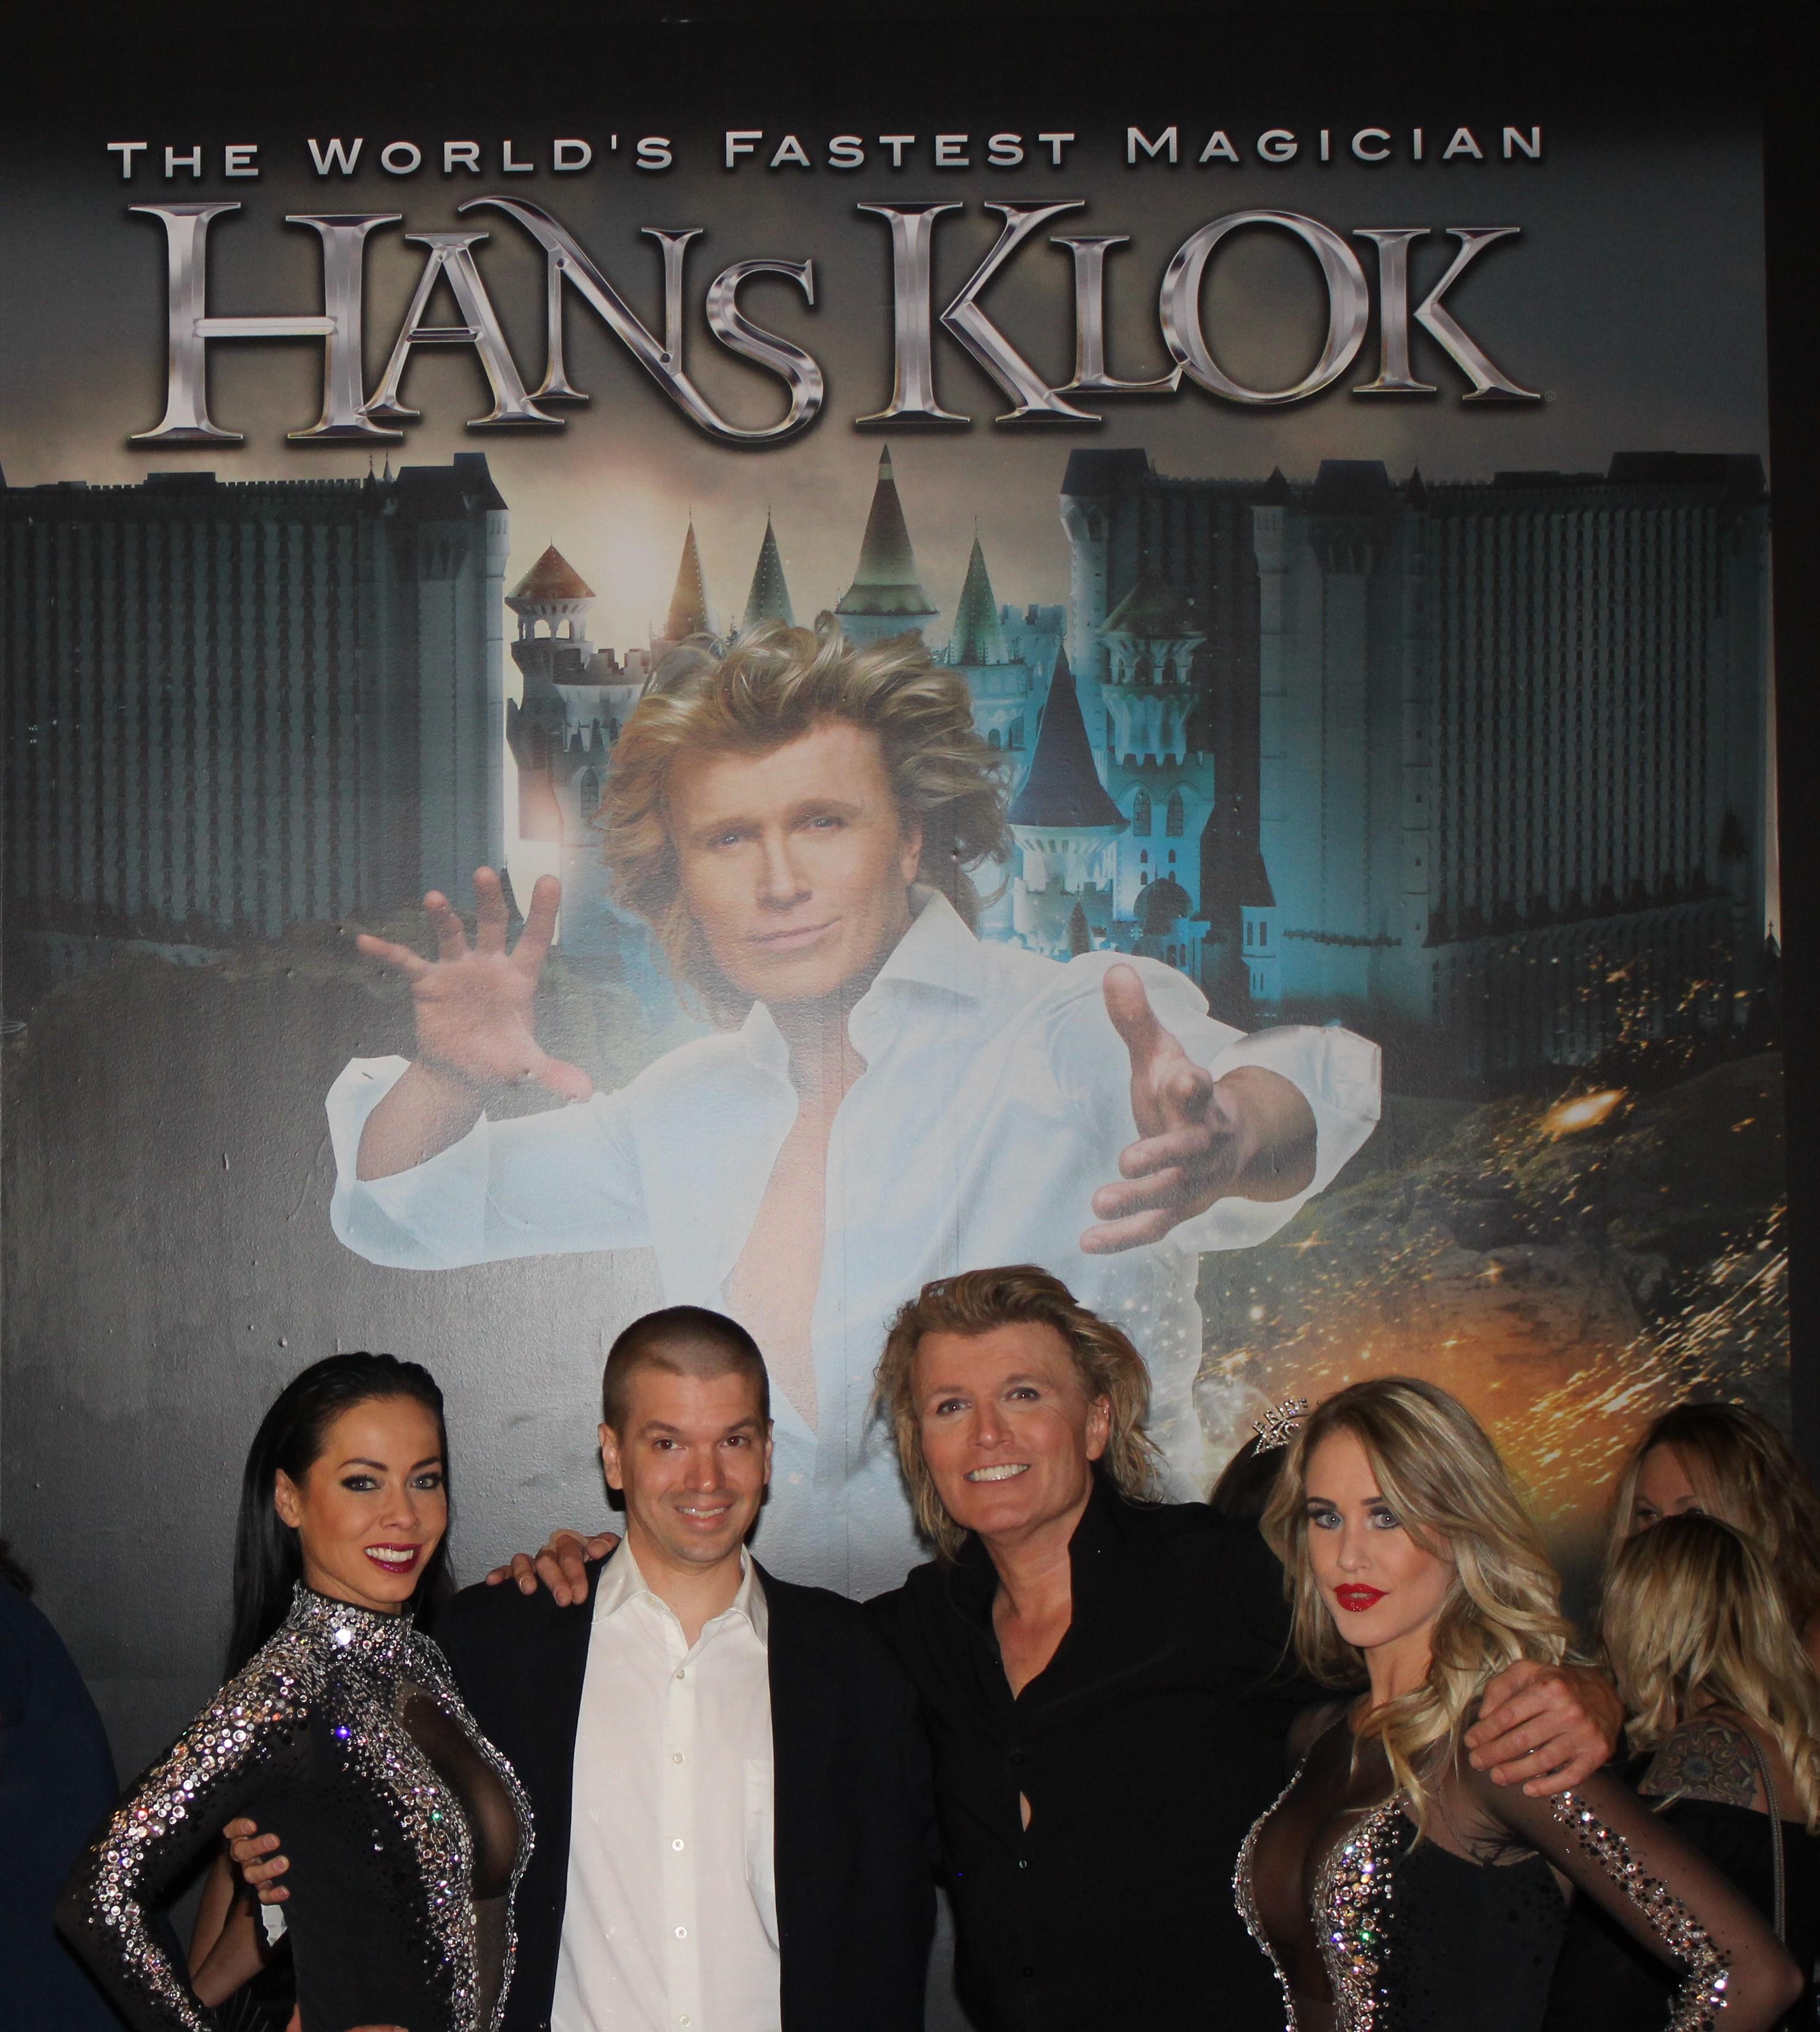 Chris Yandek, Hans Klok, Hans Klok Las Vegas Show, Bo Yael, Jenily Wagenmakers, Hans Klok Excalibur Show, Hans Klok Las Vegas Show 2019